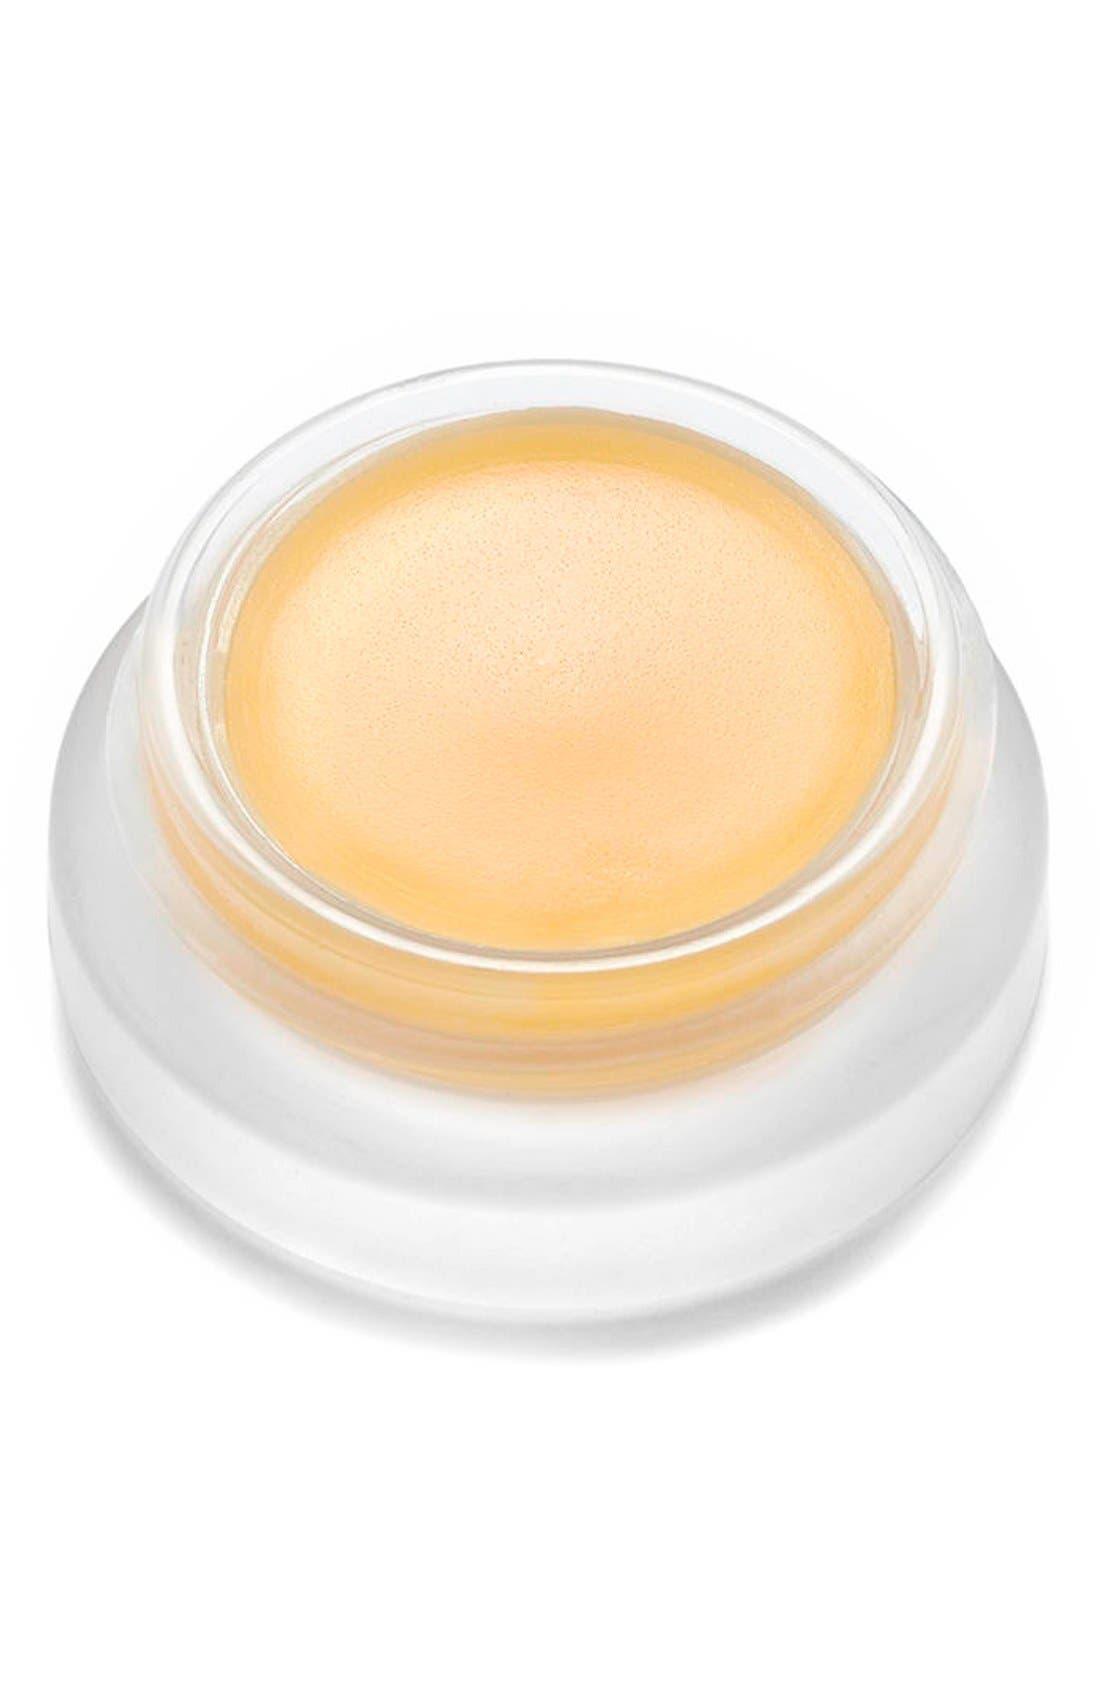 Lip and Skin Balm,                         Main,                         color, SIMPLY COCOA